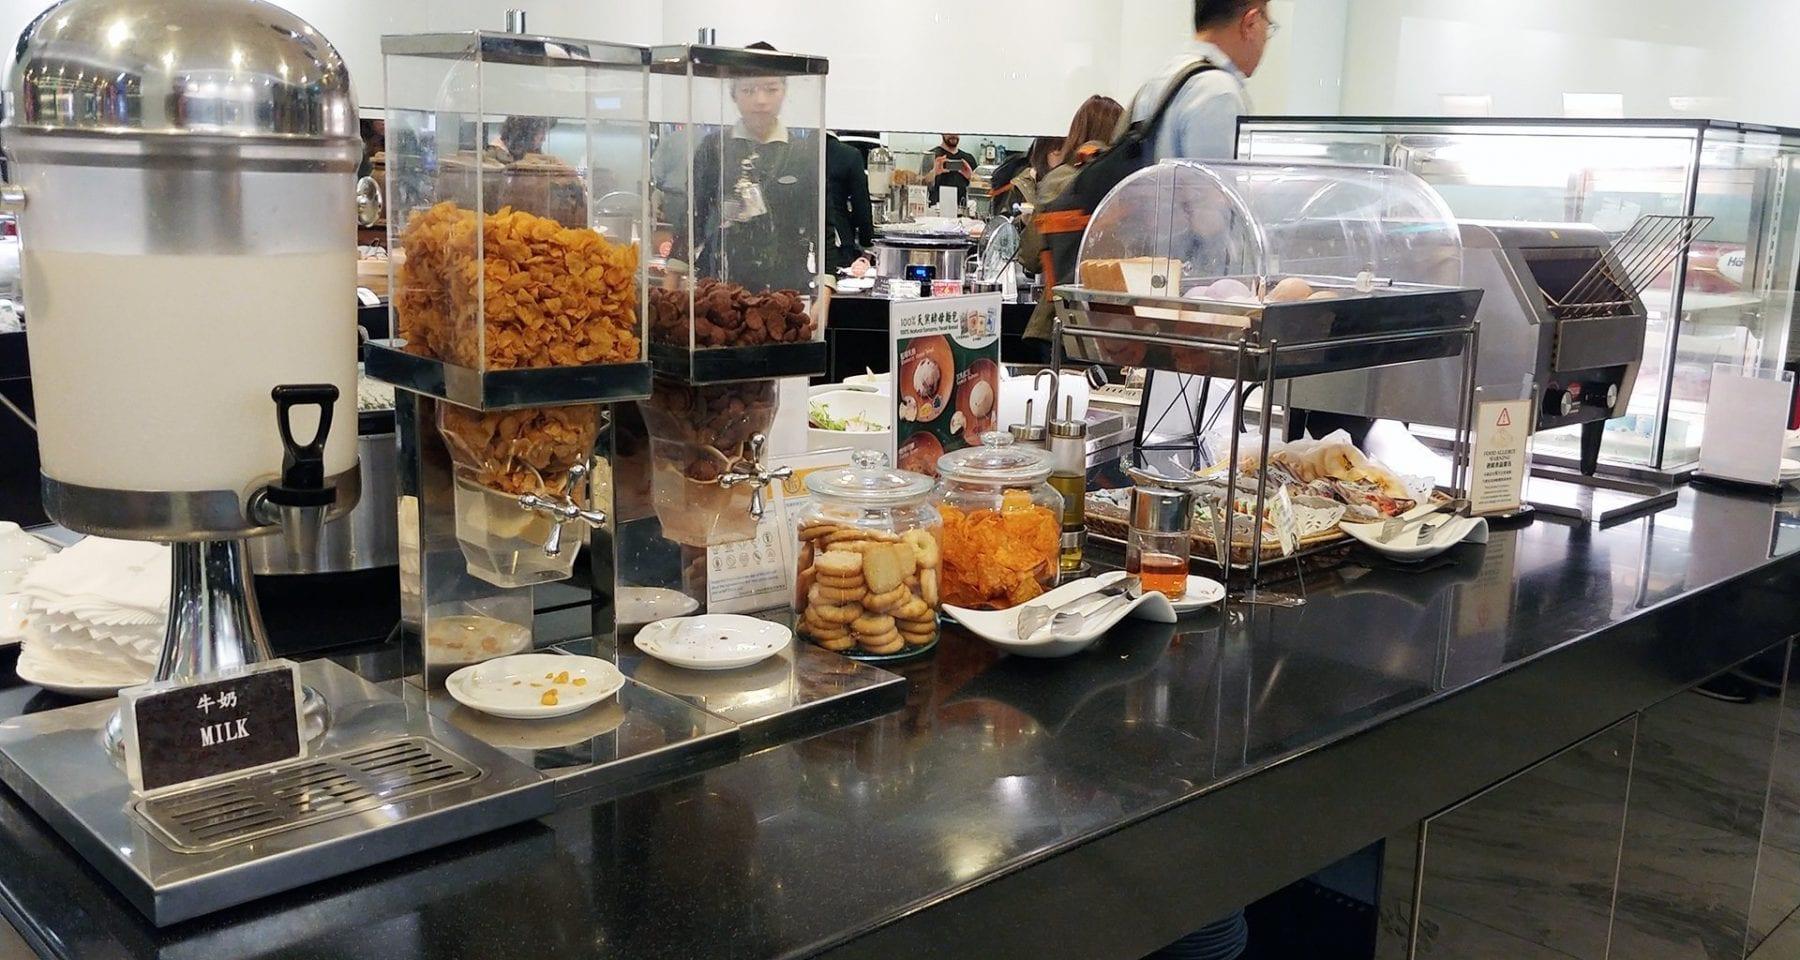 Eva Air Taipei Lounge breakfast offering